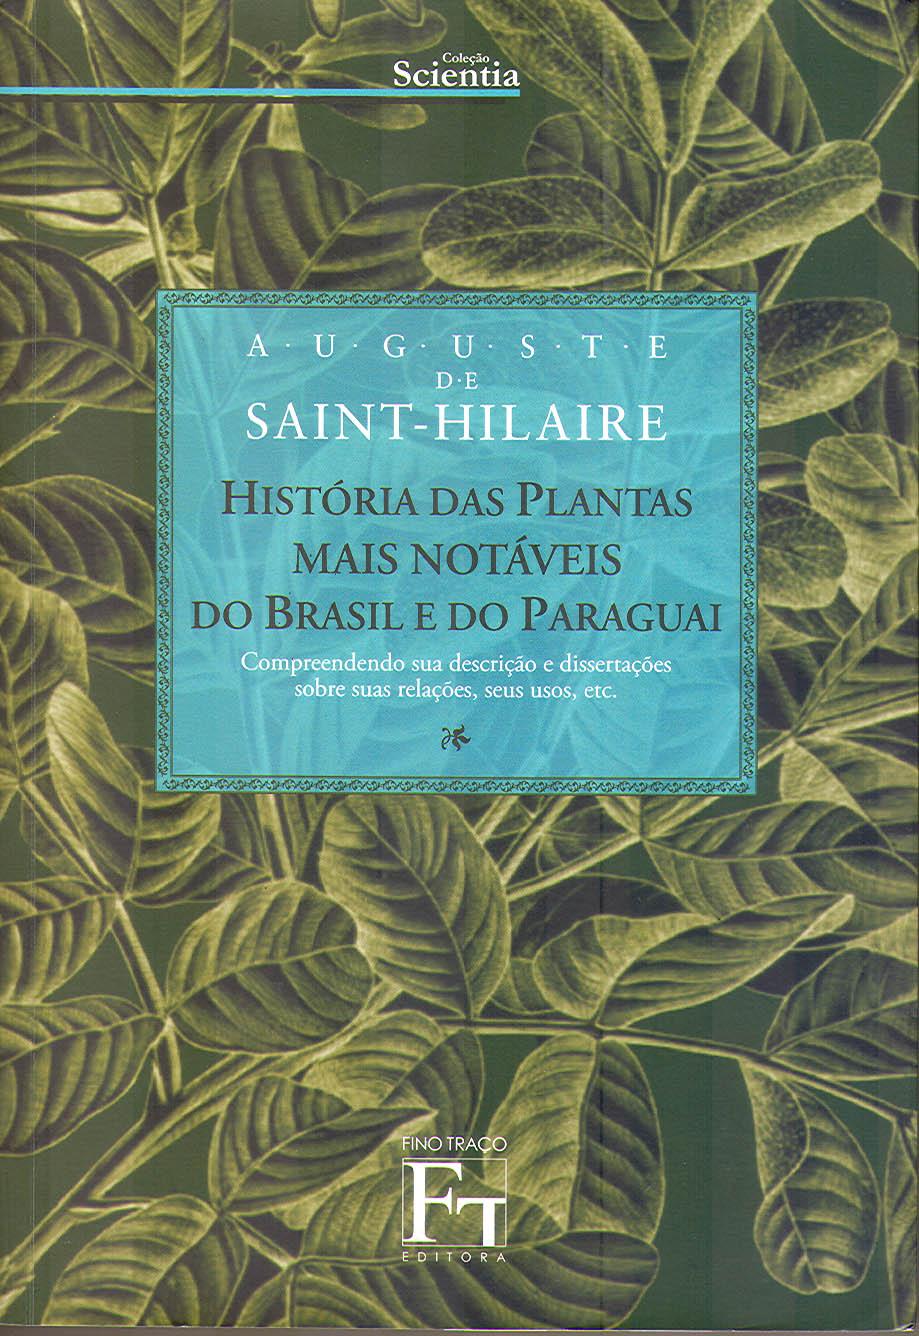 livro_saint_hilaire_2.JPG